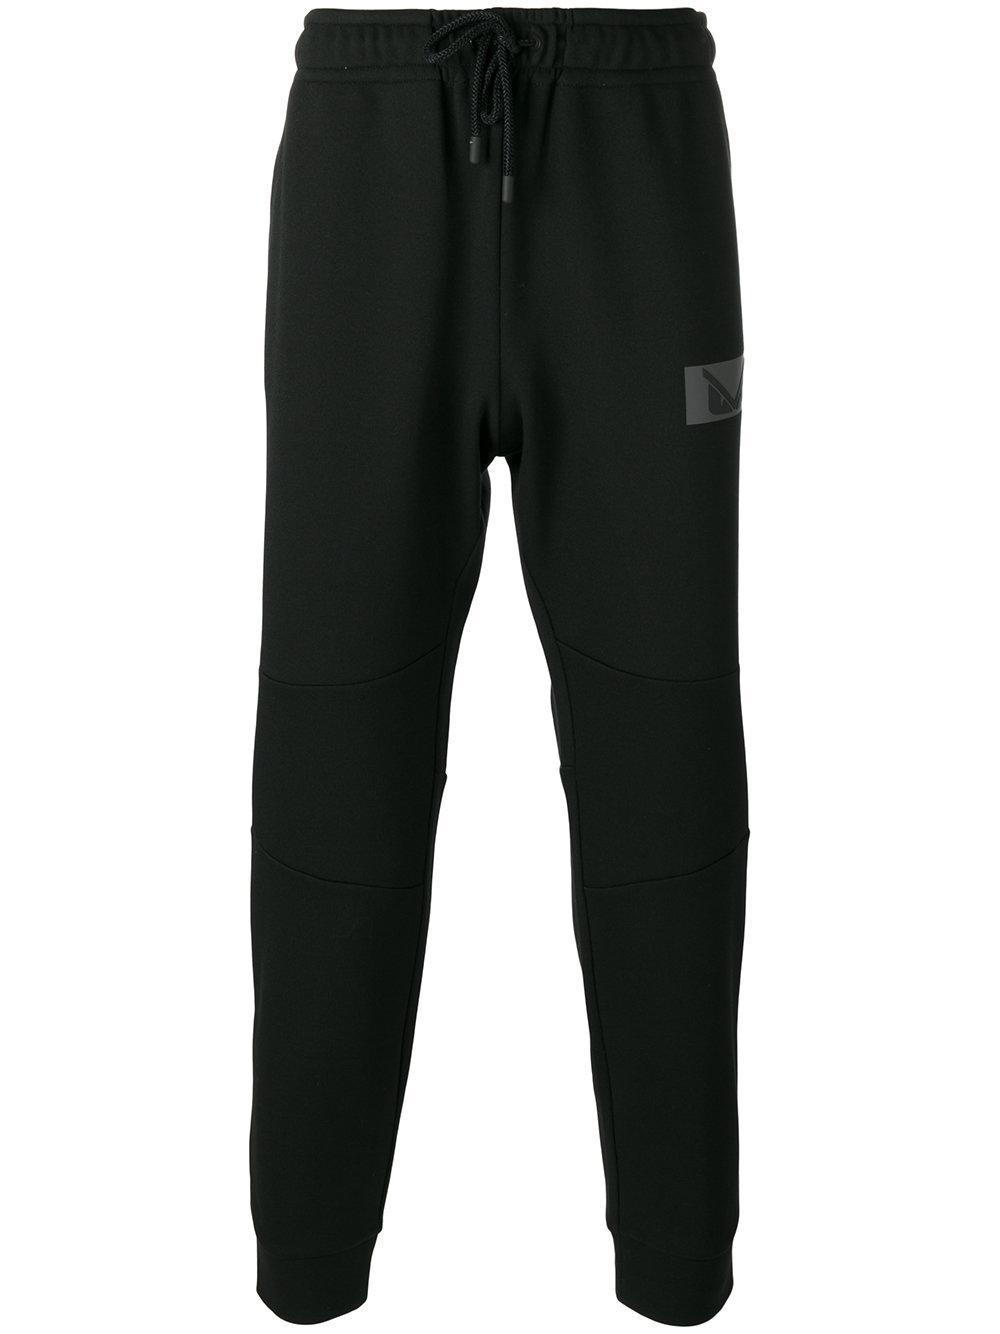 defe8a301d40 Lyst - Fendi Bag Bugs Patch Track Pants in Black for Men